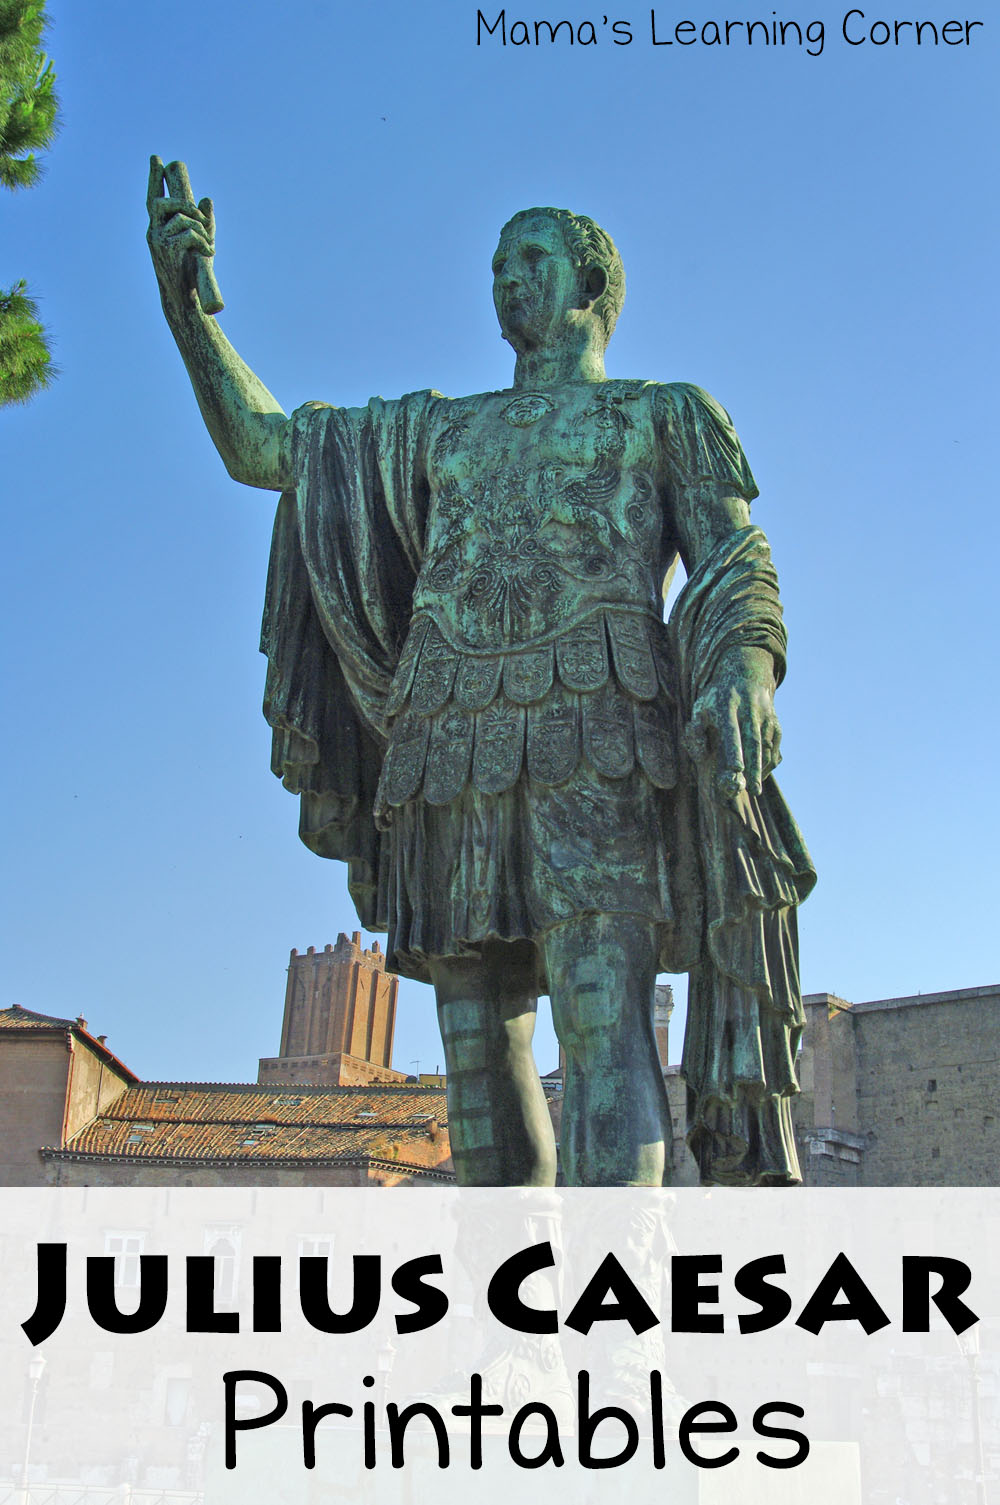 medium resolution of Free Printables for Julius Caesar Unit Study - Mamas Learning Corner